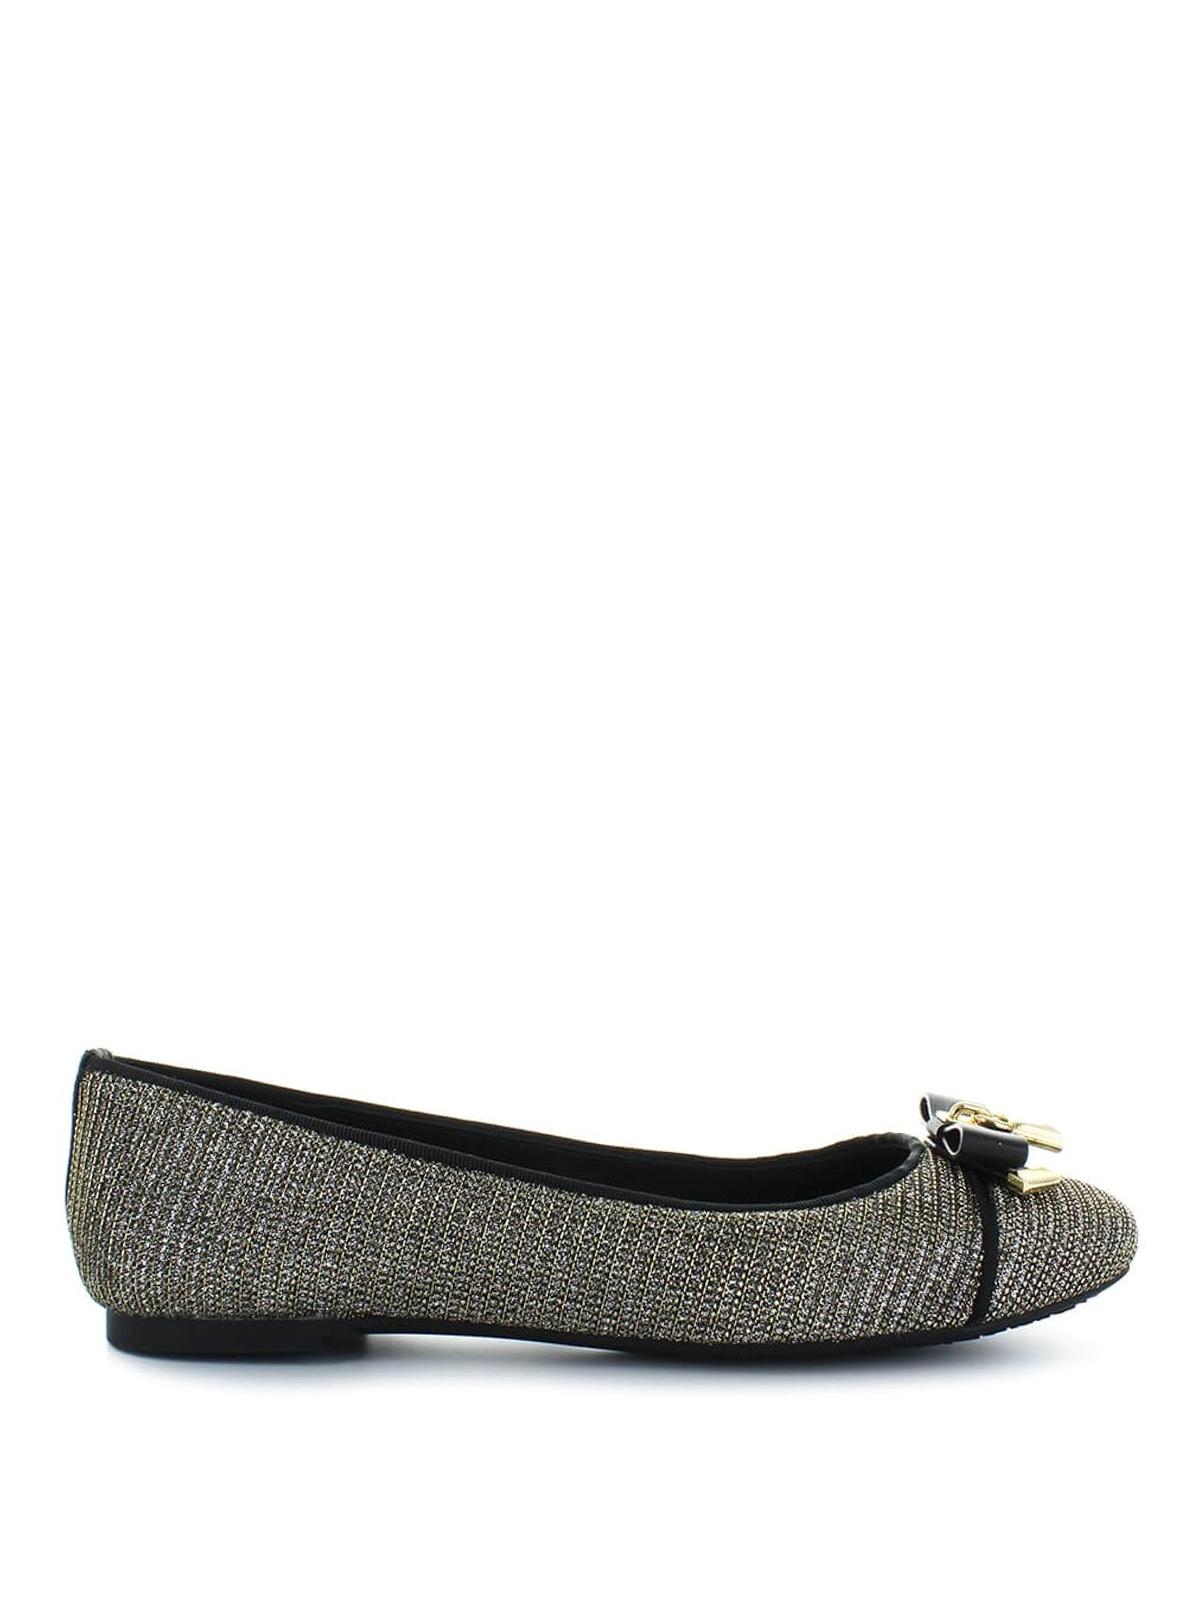 d46f2bc633ad MICHAEL KORS  flat shoes - Alice Ballet silver metallic fibre ballerinas